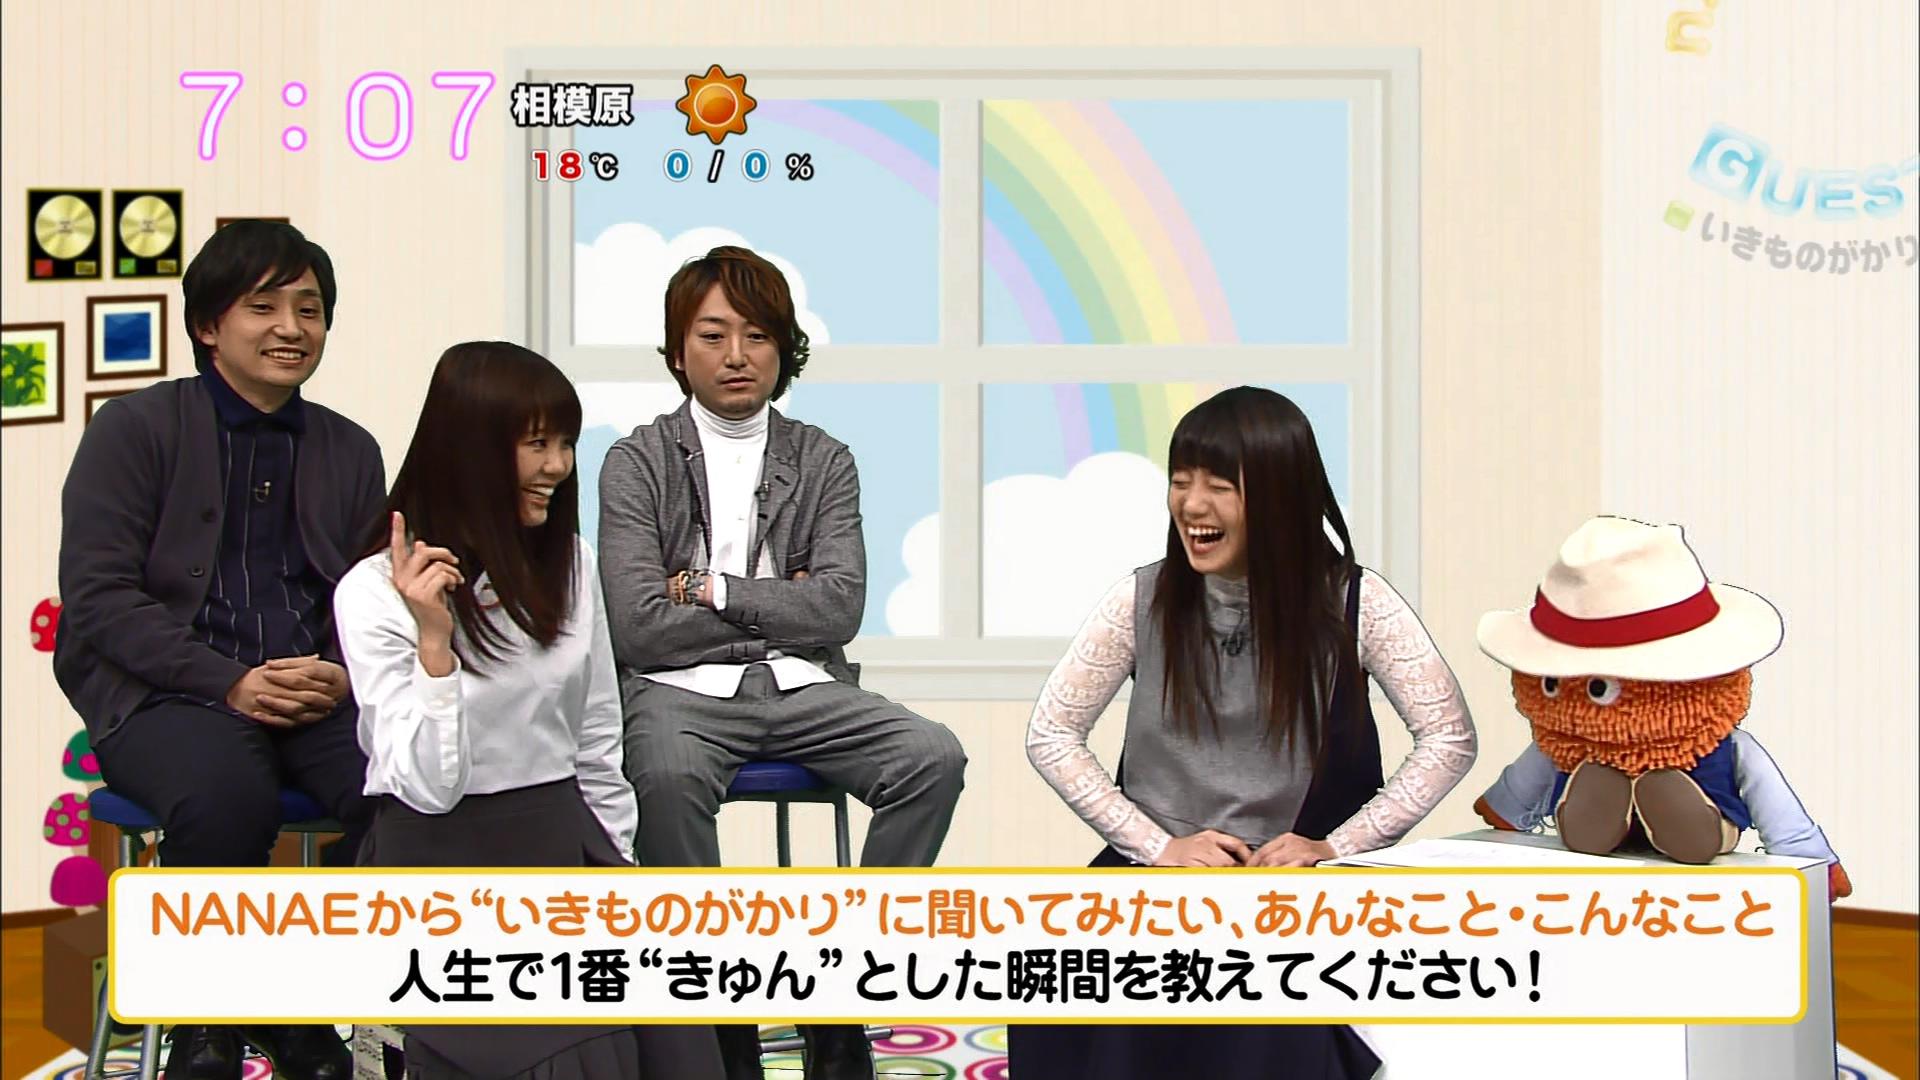 2016.03.17 いきものがかり(saku saku).ts_20160317_080205.106